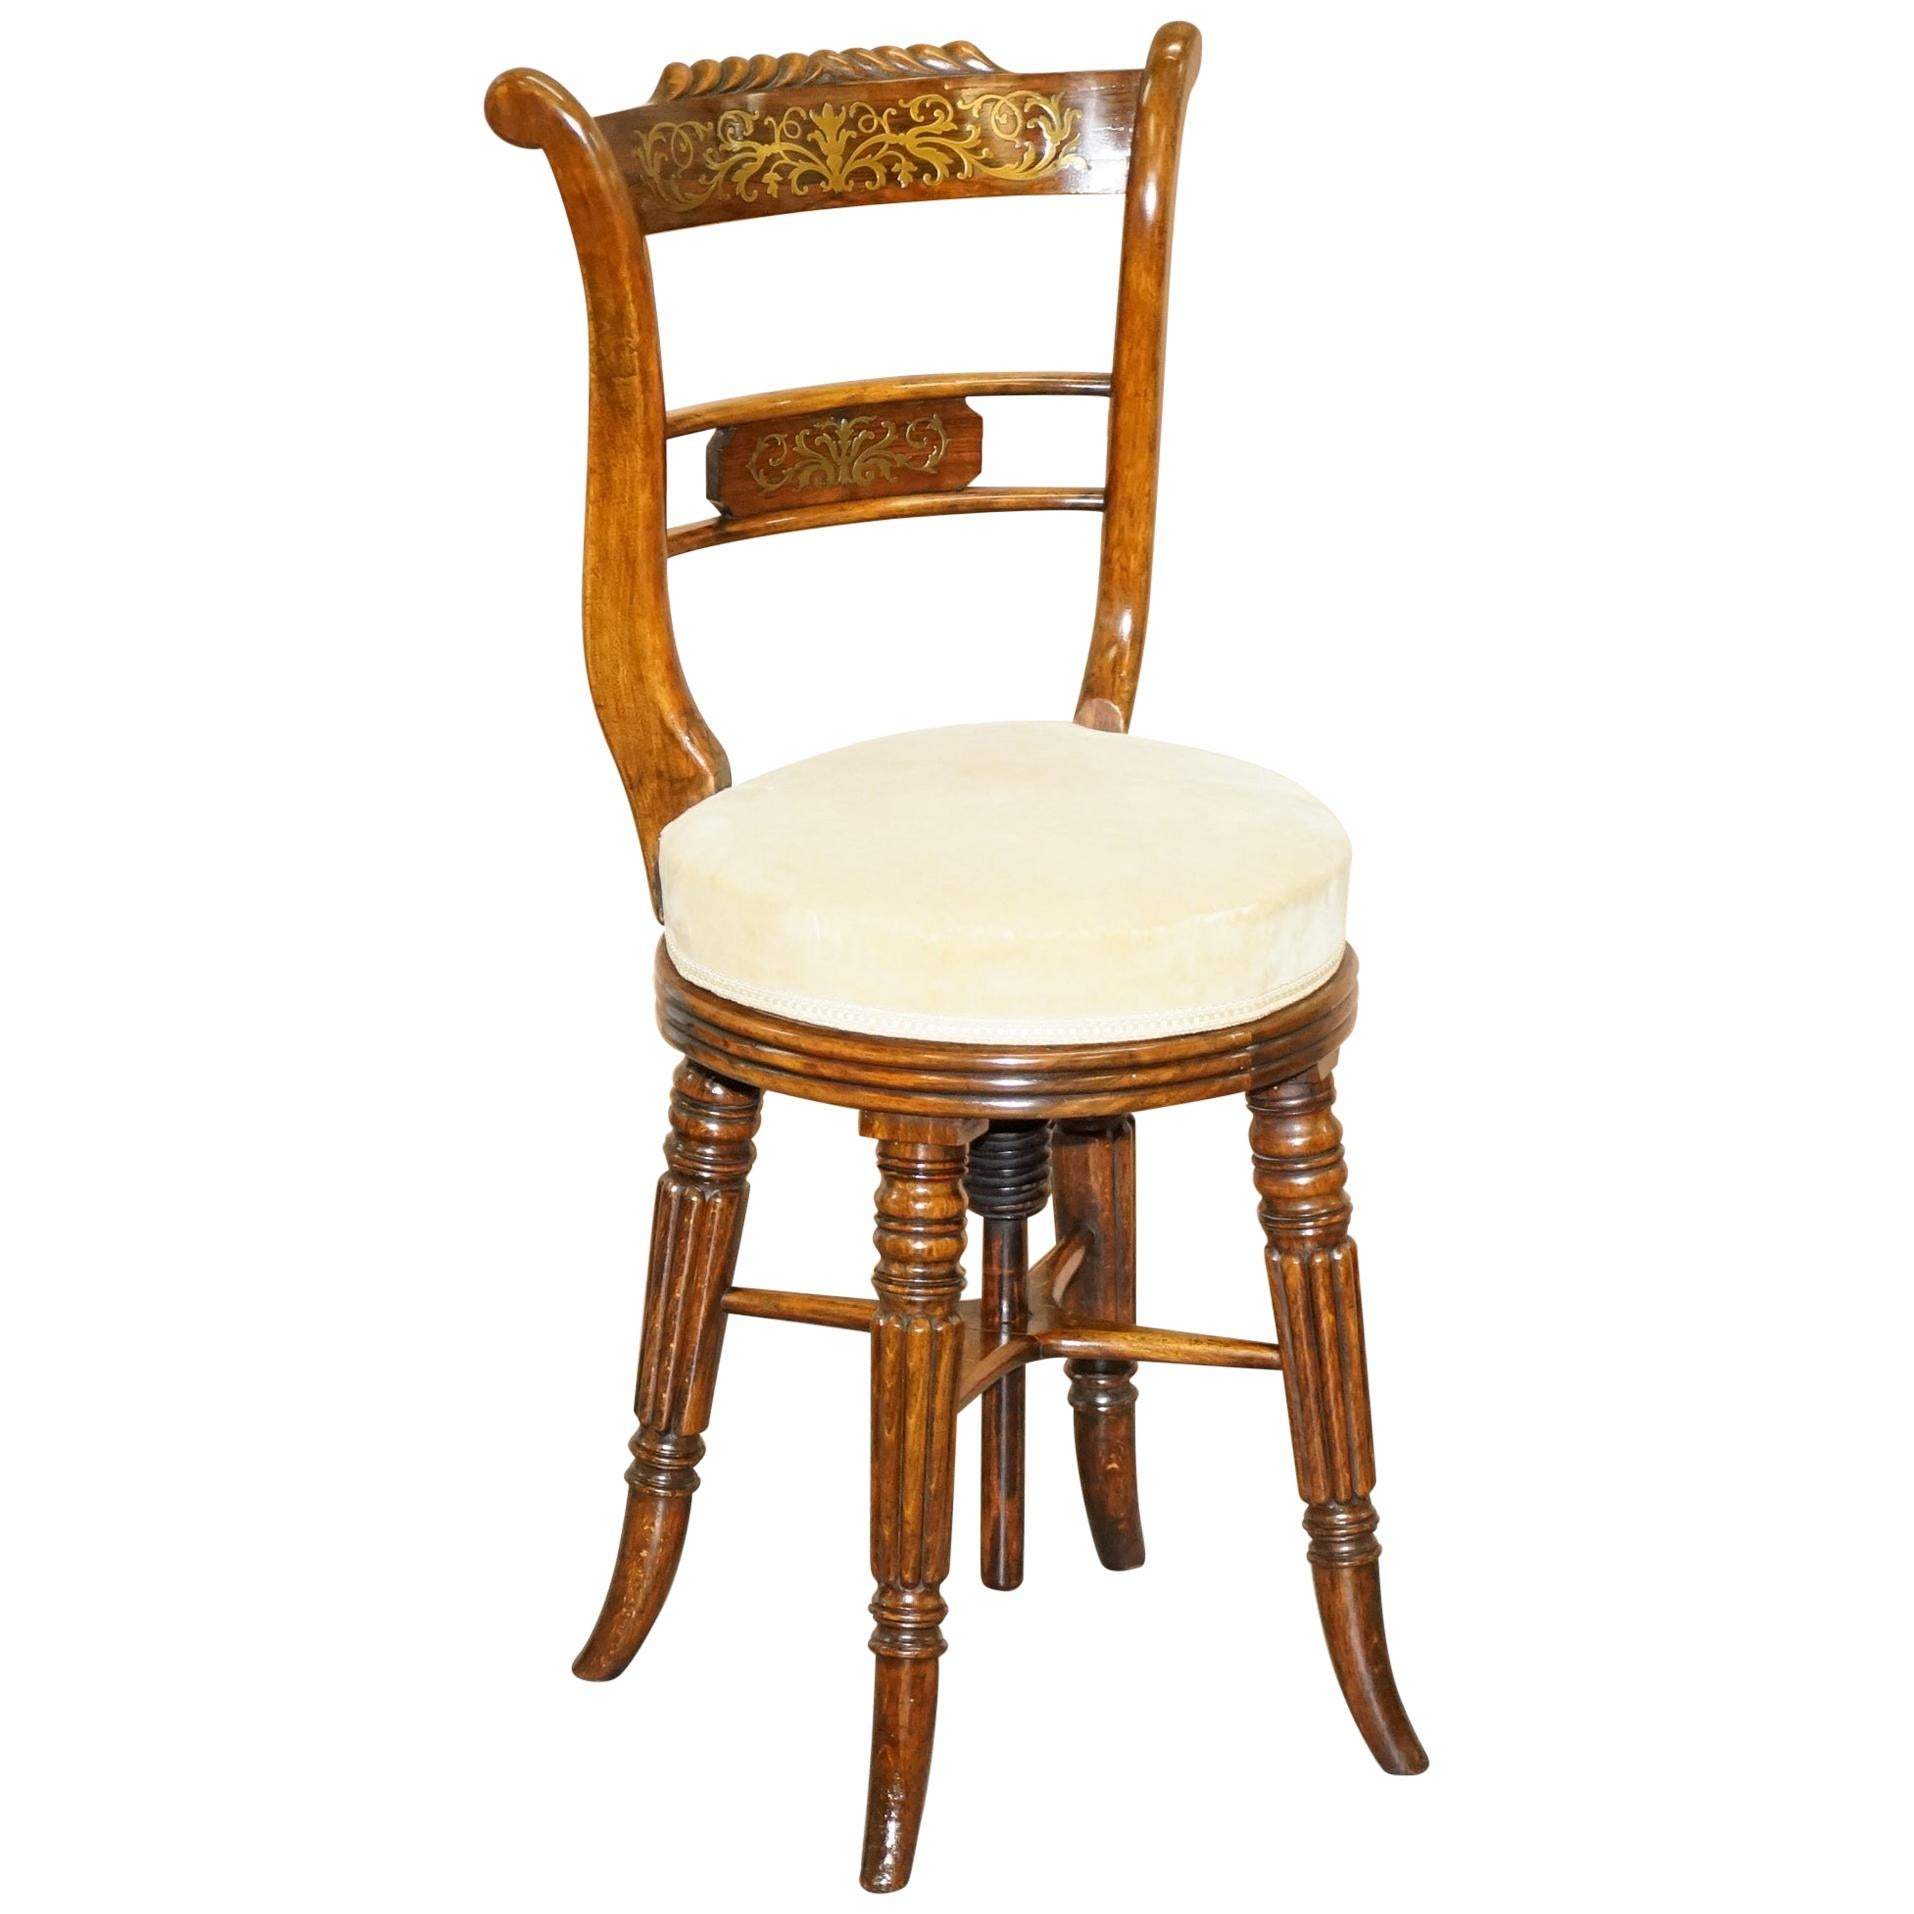 Very Rare Gillows of Lancaster Regency Hardwood Harpist Height Adjustable Chair